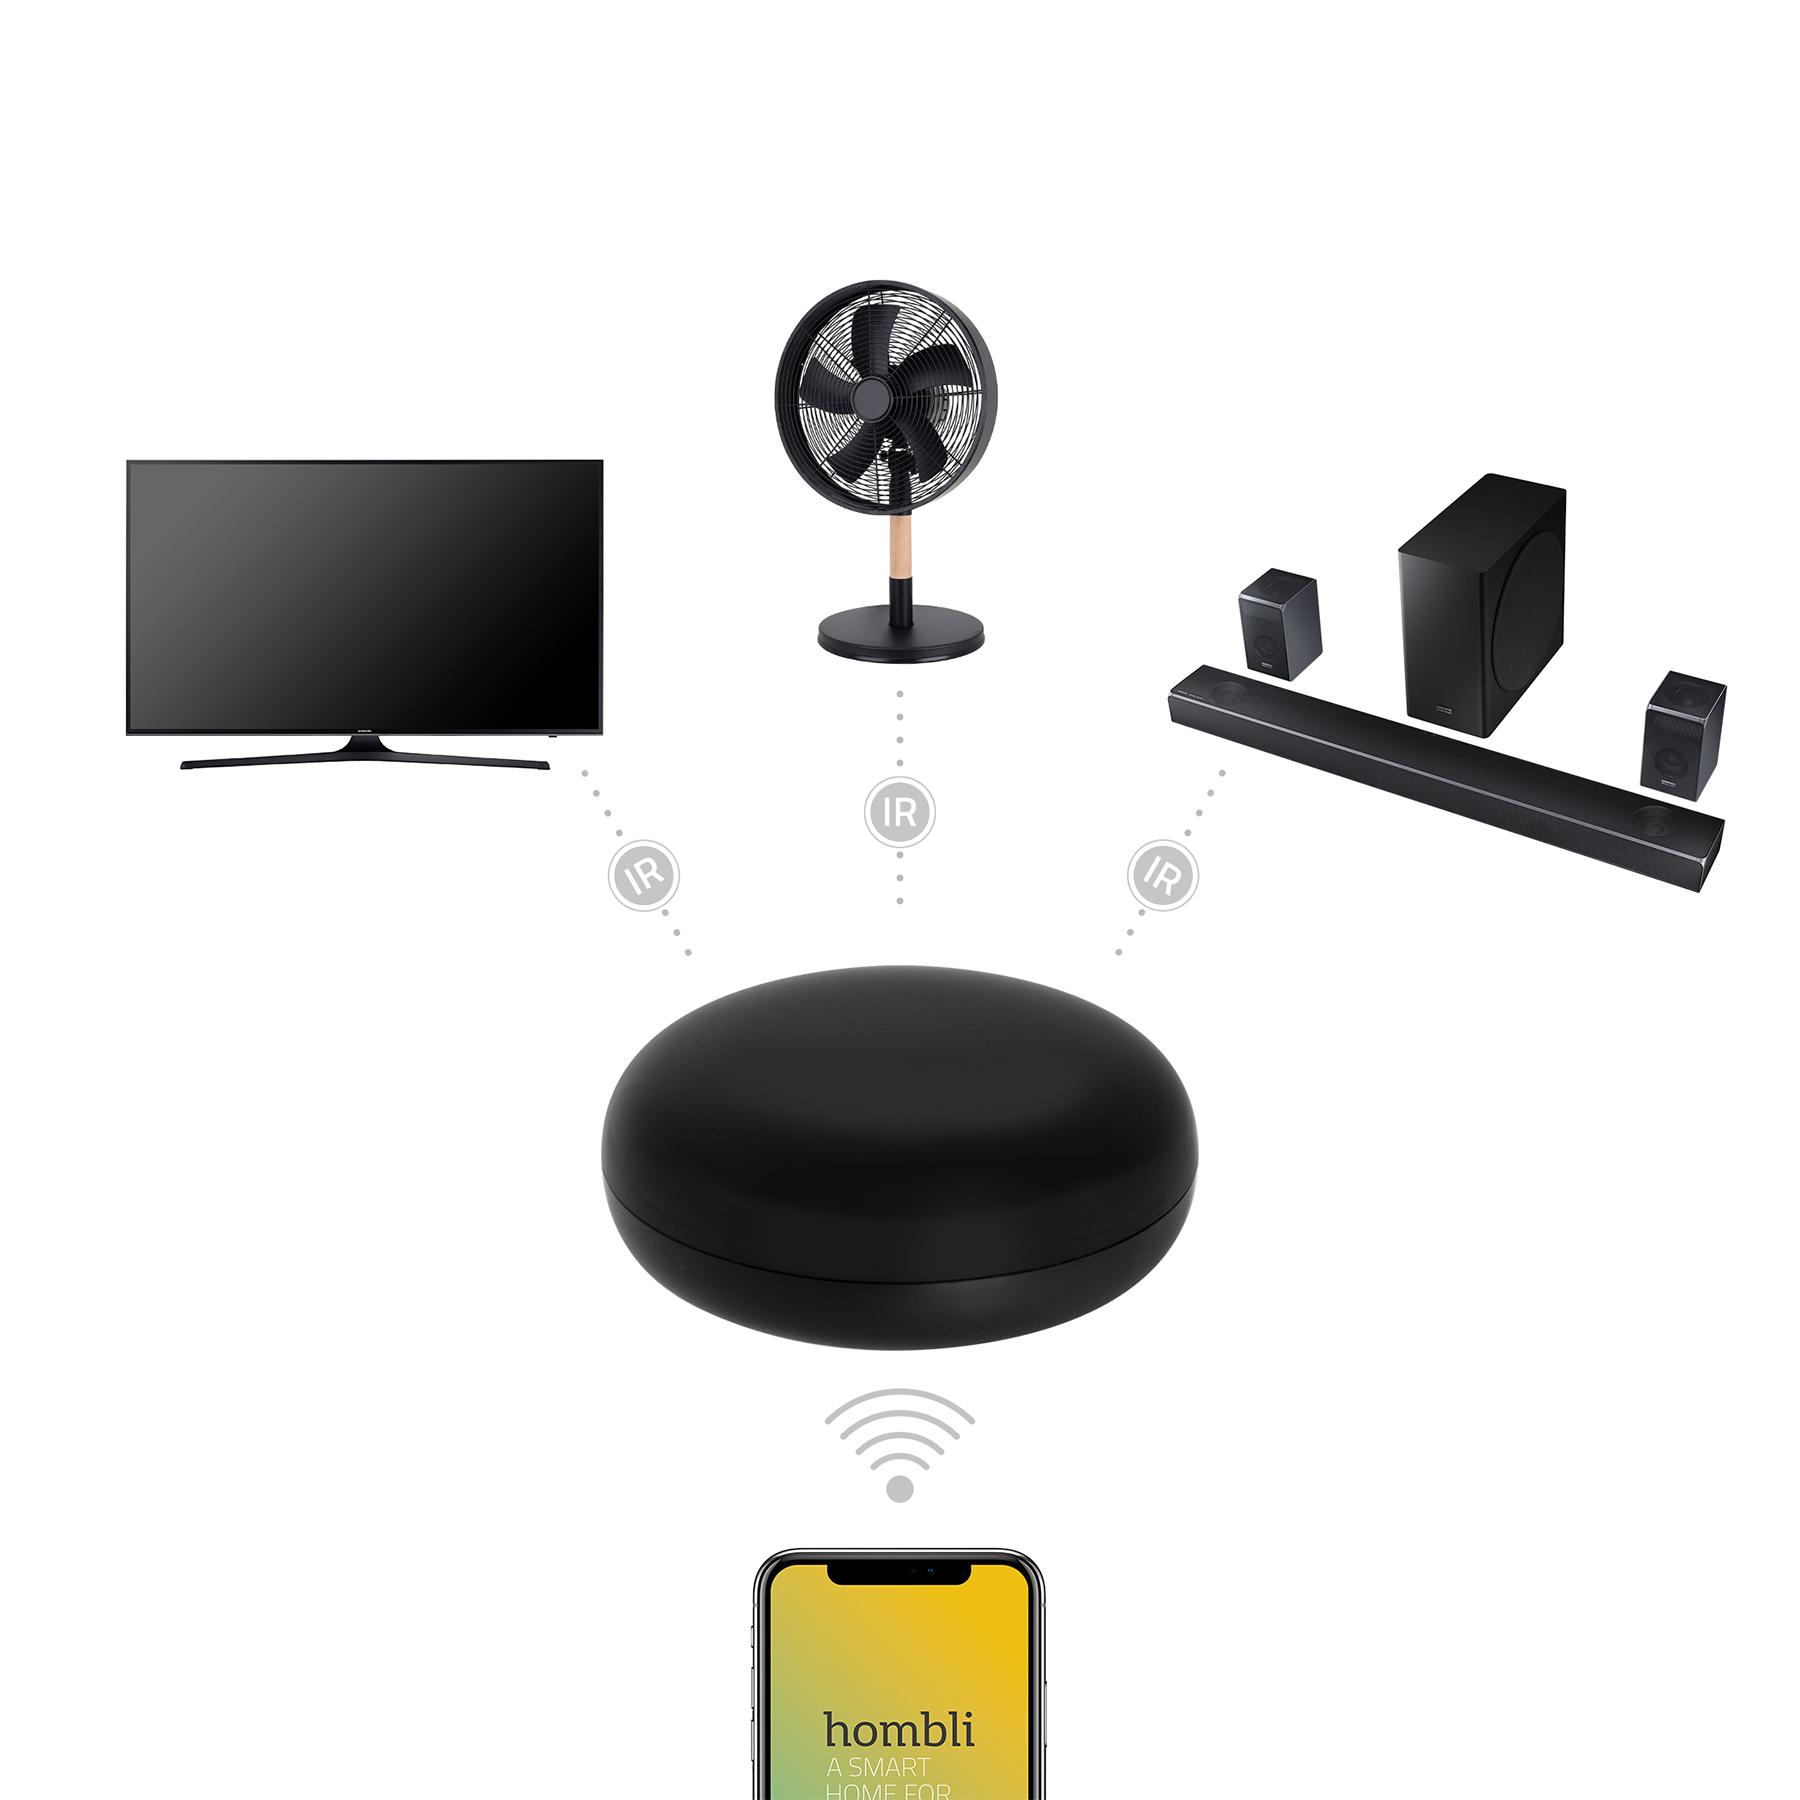 Hombli Smart IR Remote Control